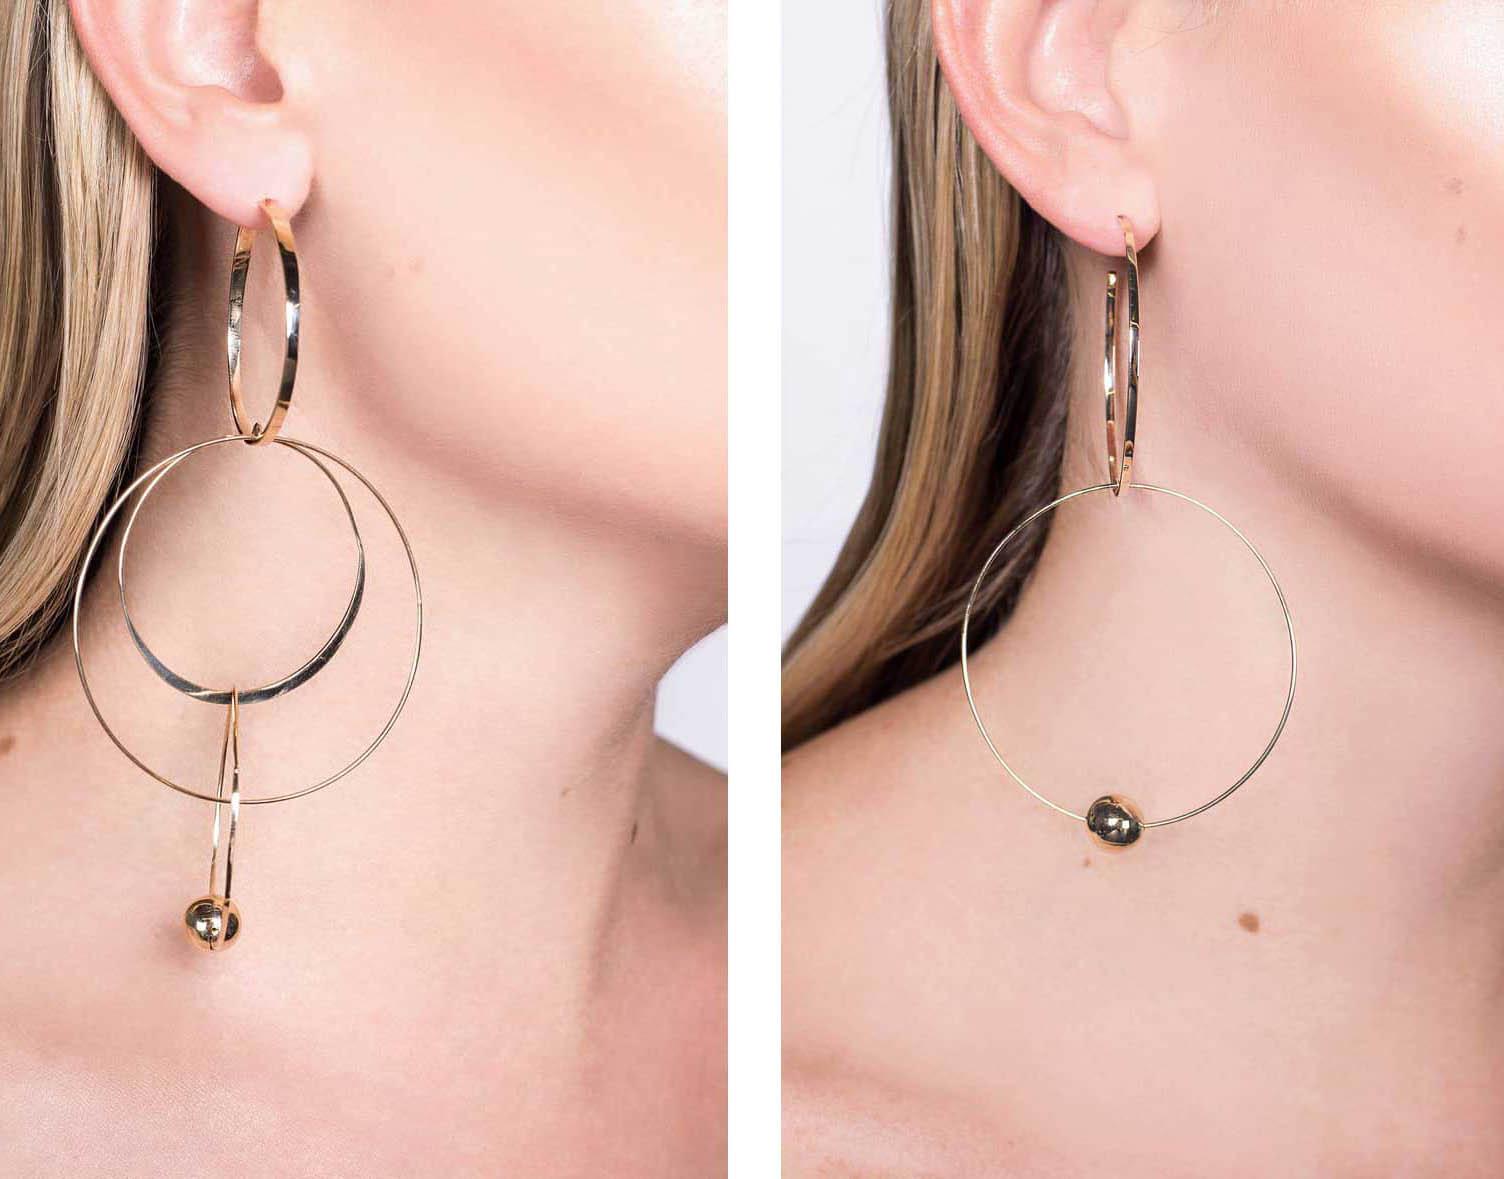 Flat Wire Mixed Hoop Drop Earrings and Bond Link Double Hoop Earrings by Lana Jewelry, Runway Jewelry Trends 2019